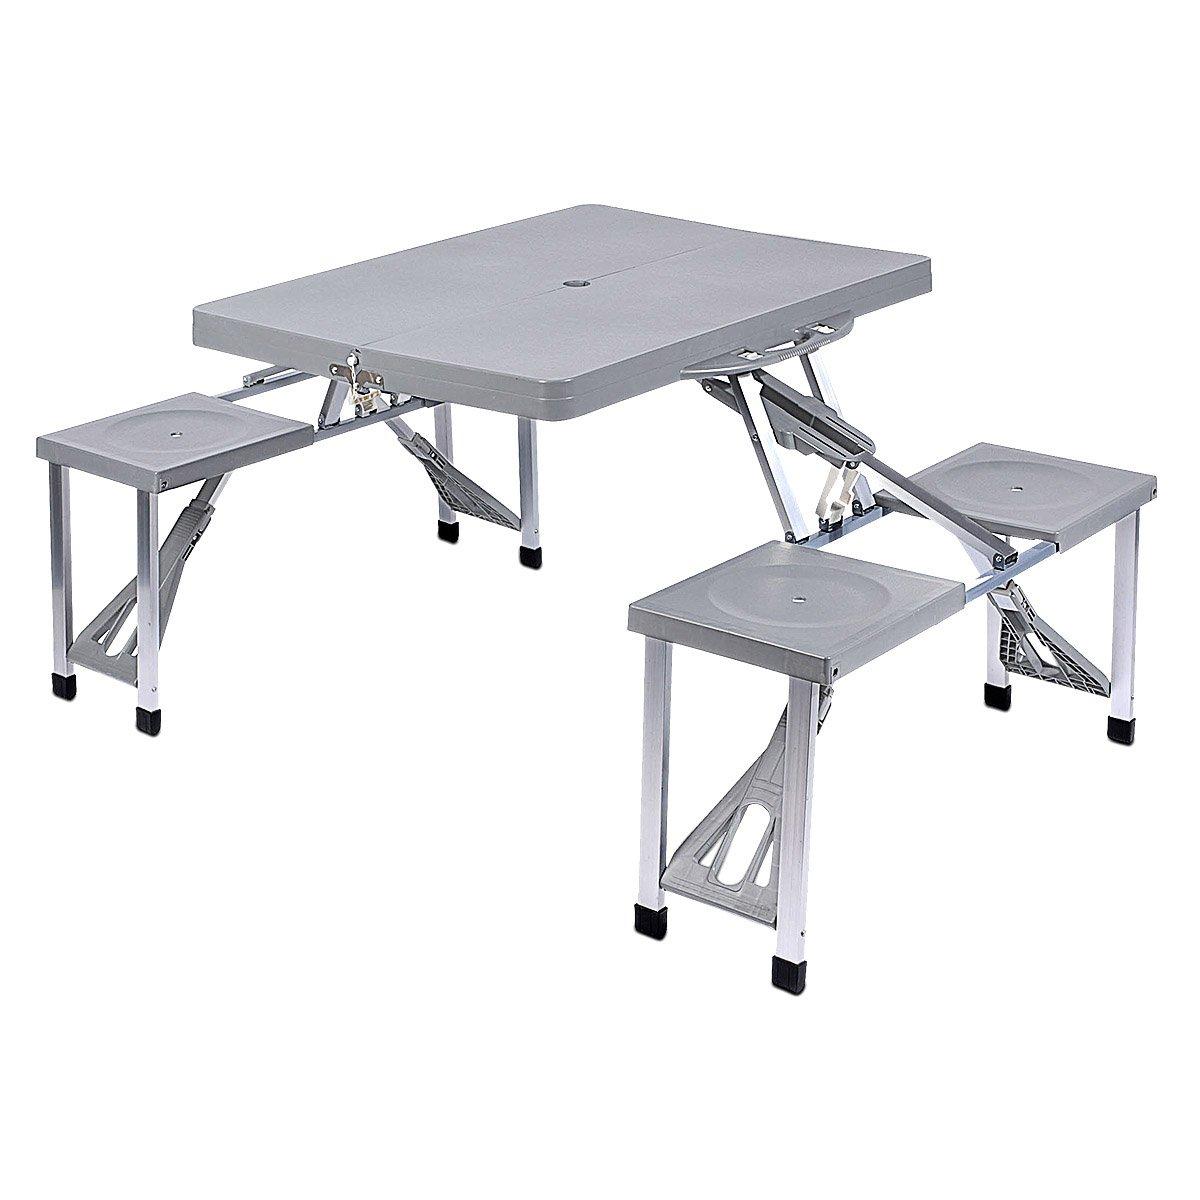 table camping gifi good table de camping pliante leclerc le havre with table pliante leroy. Black Bedroom Furniture Sets. Home Design Ideas